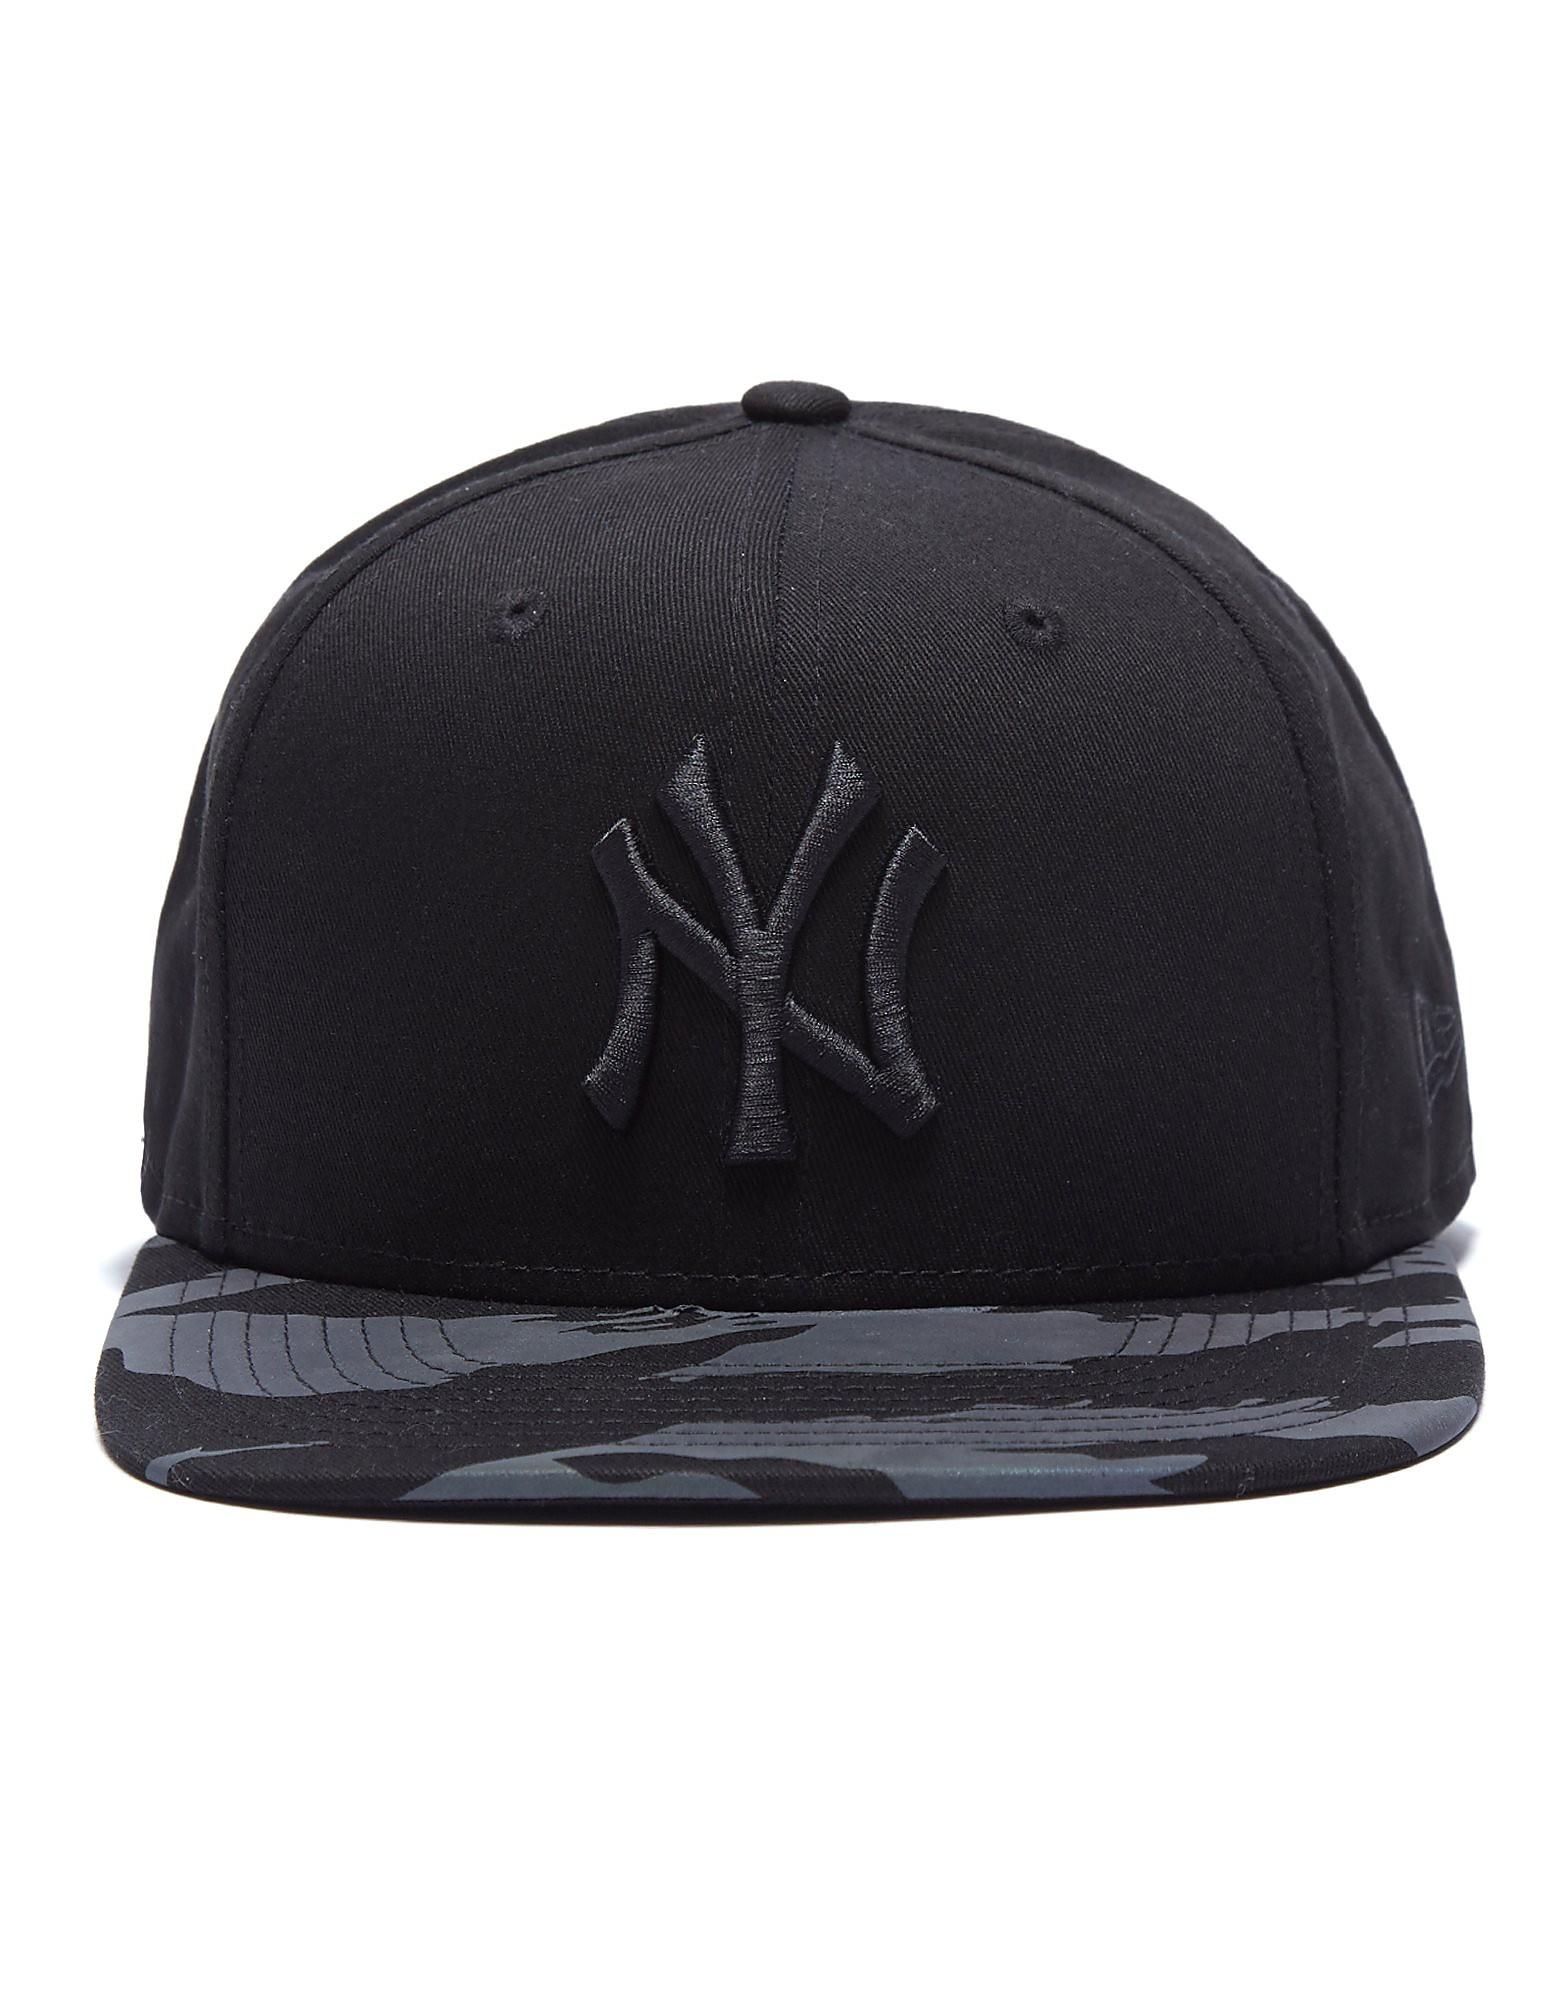 New Era MLB New York Yankees 9FIFTY Reflective Visor Cap